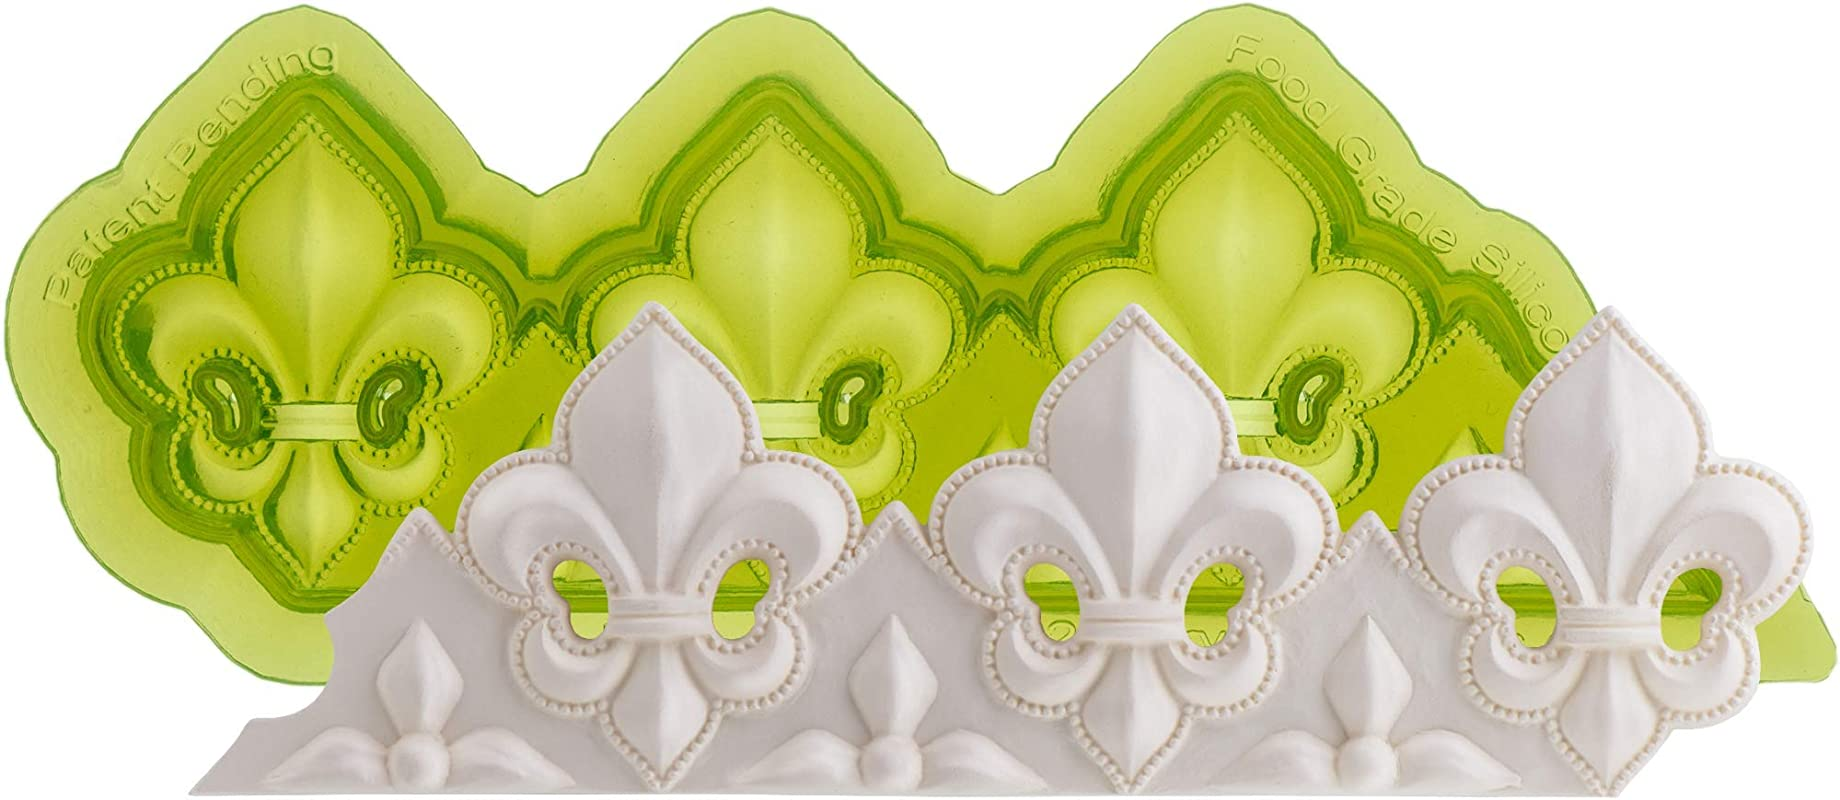 Marvelous Molds Fleur De Lis Silicone Cake Border Mold Cake Decorating Fondant Gumpaste Icing